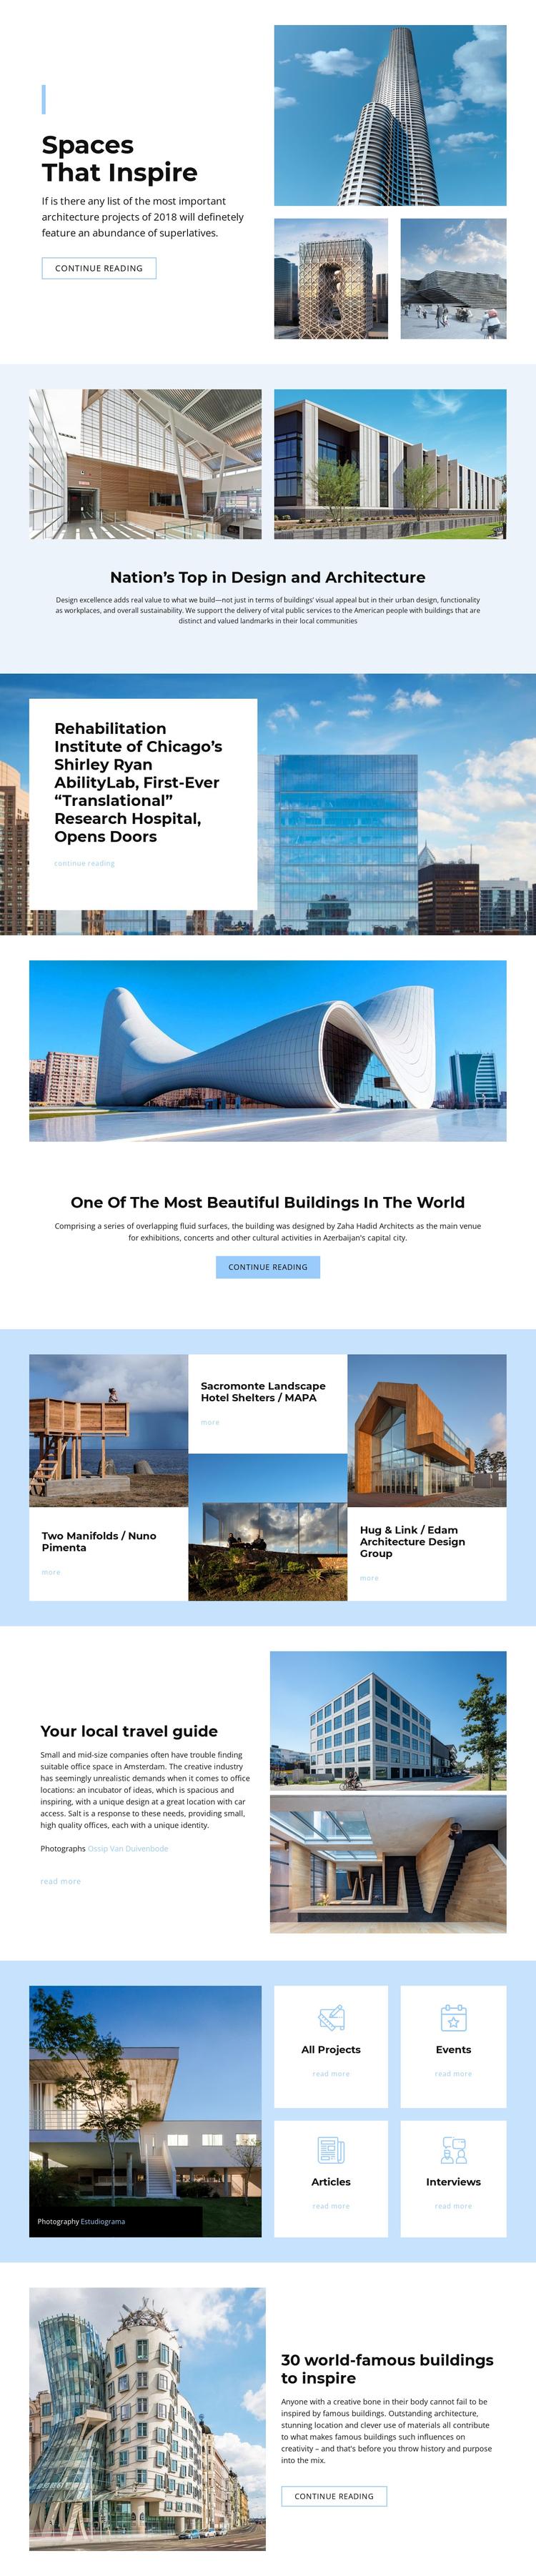 Space-inspired architechture Website Builder Software